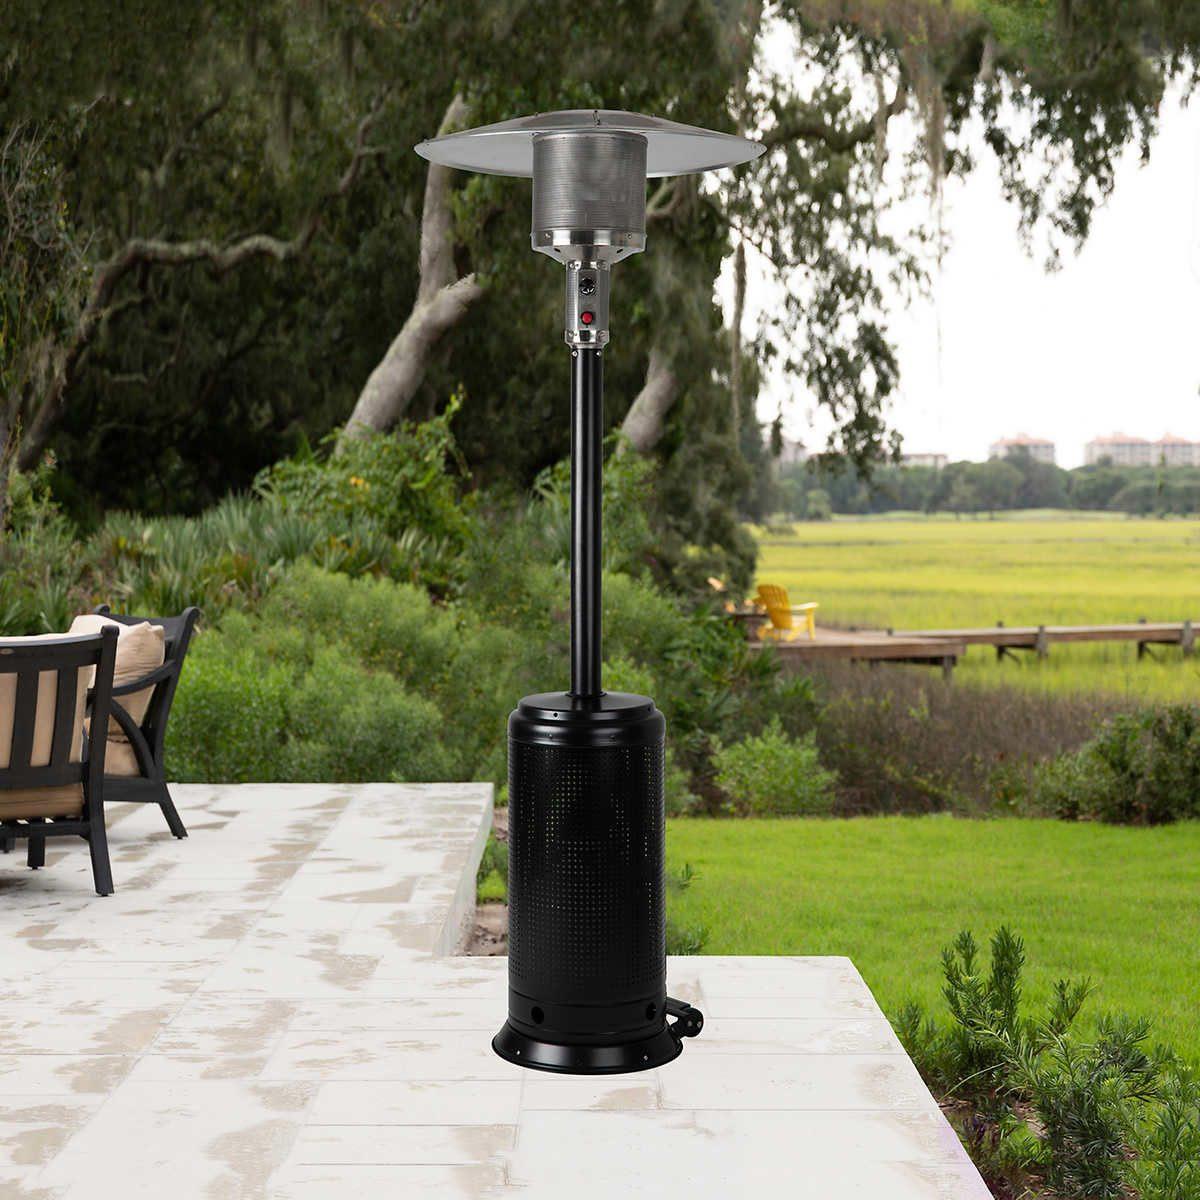 propane patio heater usage and